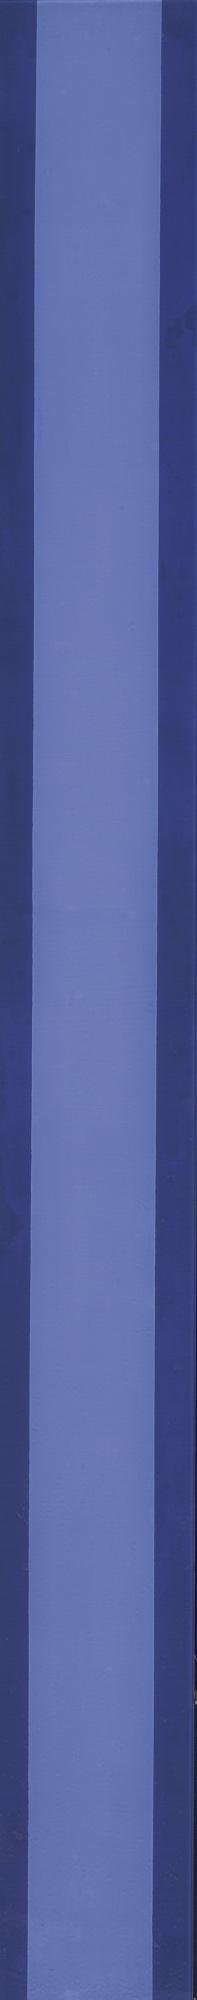 Barnett Newman-The Moment-1966